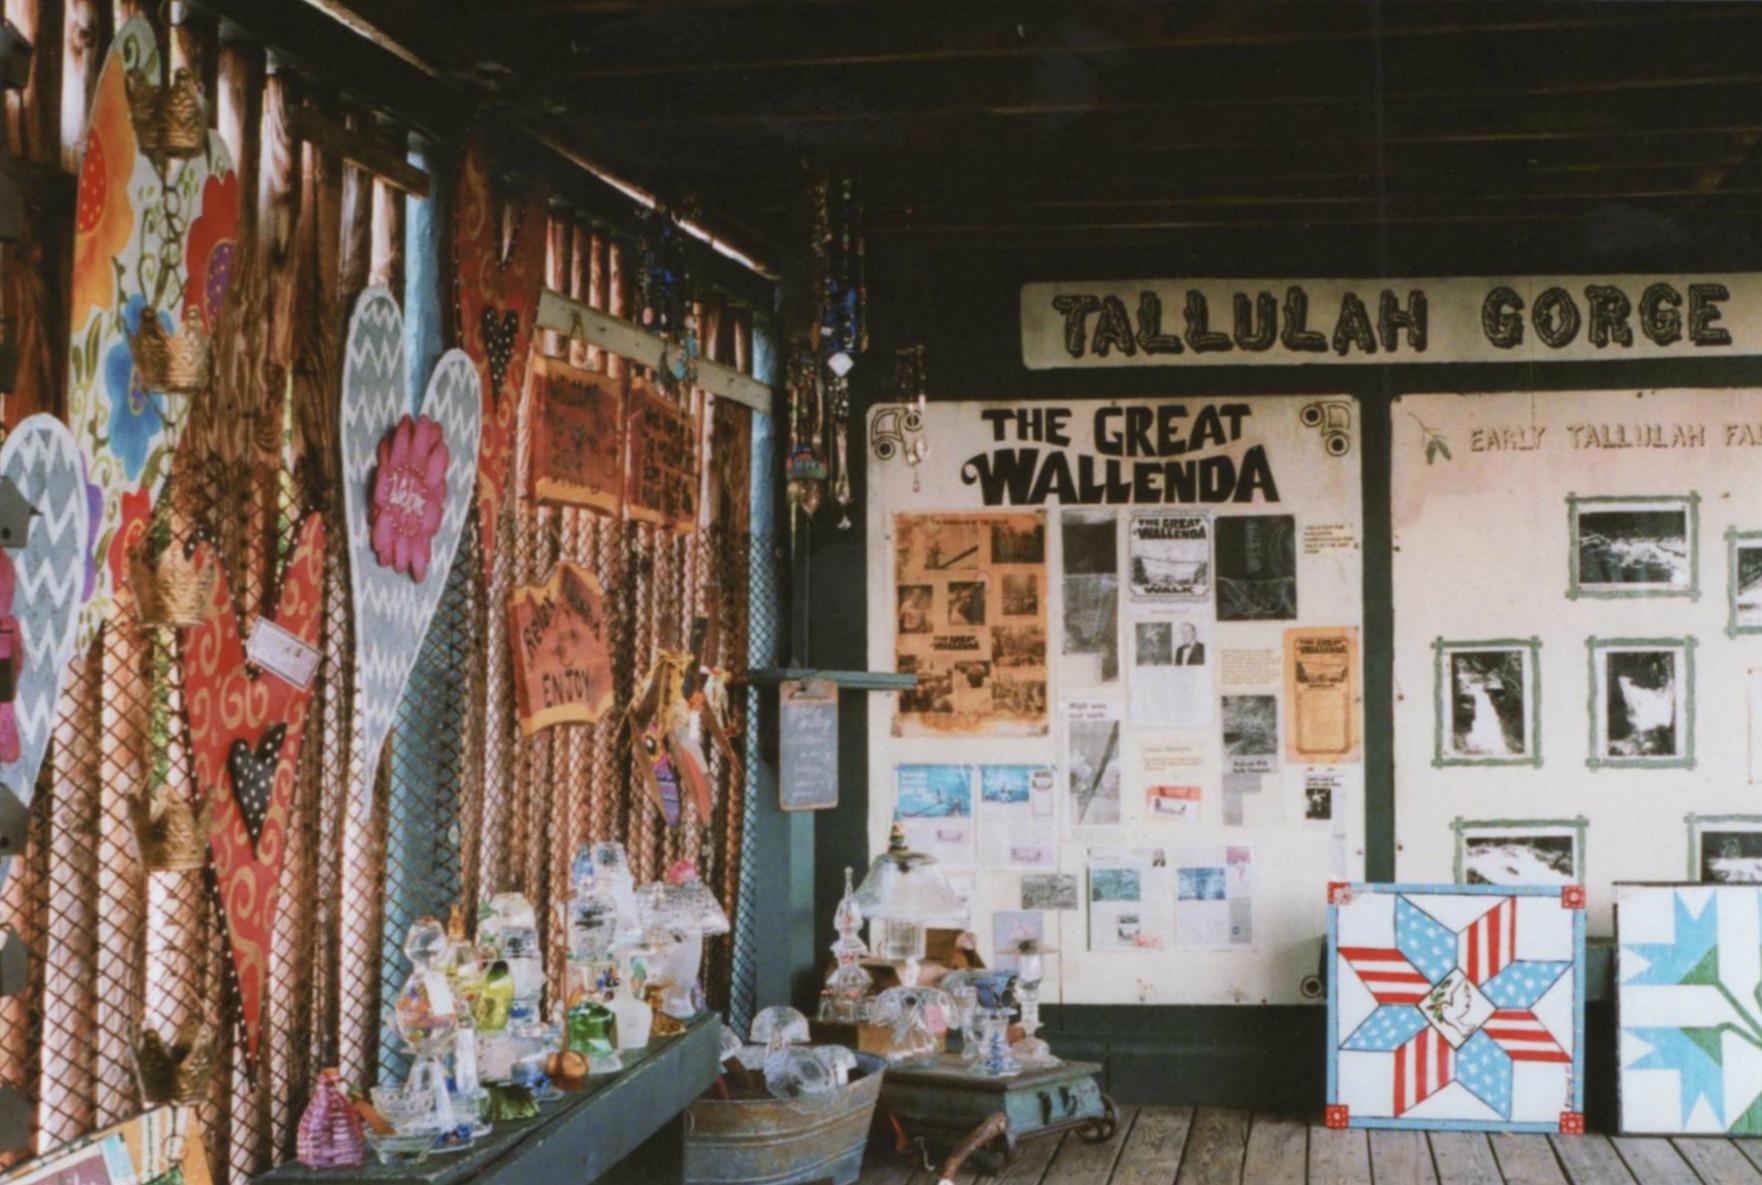 tallulah gorge.jpg